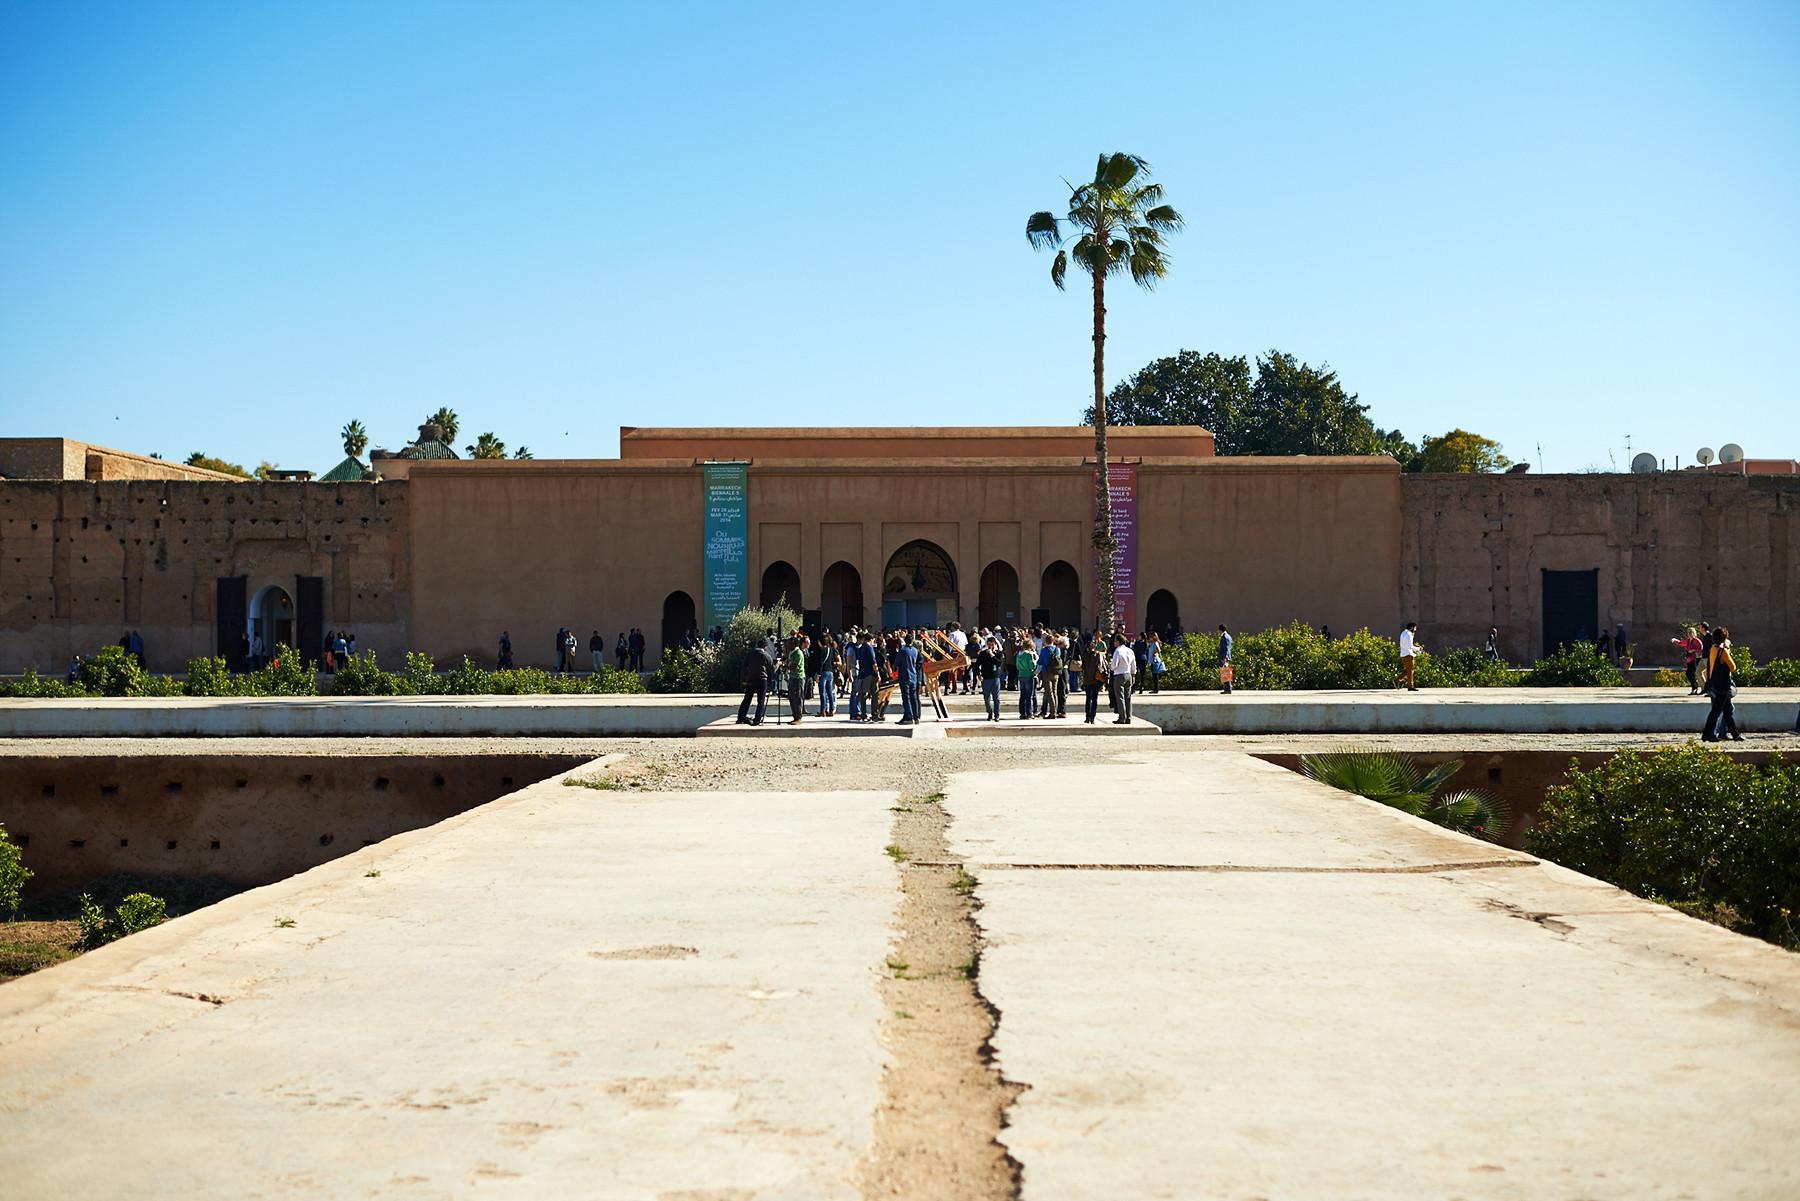 Marrakesch Bienale Event Eventfotograf Eventfotografie Marokko Afrika Dokumentation Dokumentationsfotografie Dokumentationsfotograf Werbefotograf Werbung Fotografie Foto Fotograf Auftragsfotograf Auftragsfotografie Philipp Löffler Loeffler - München